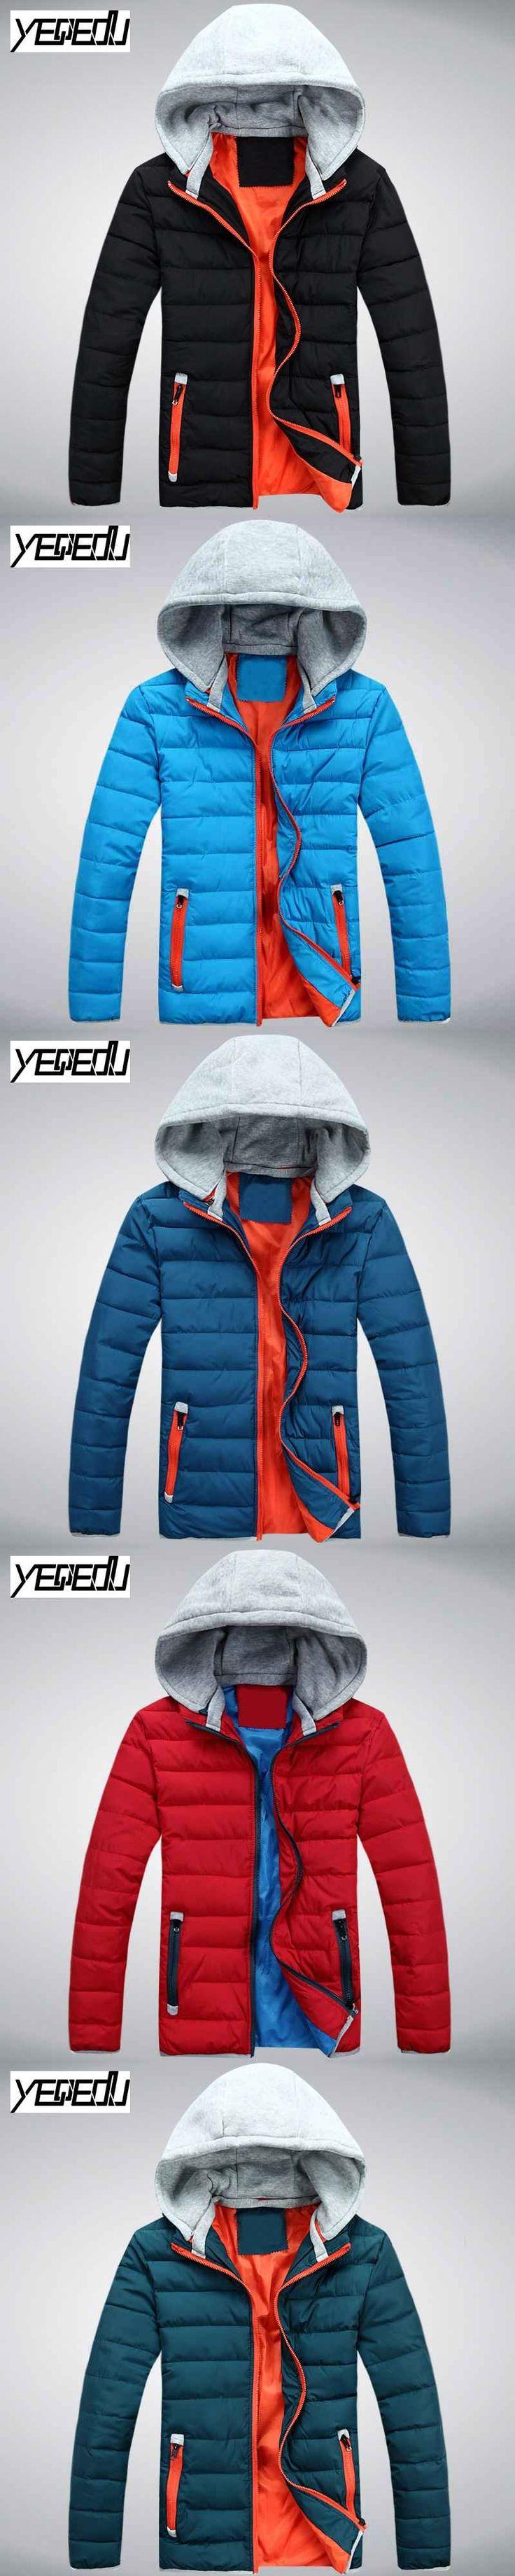 #2459 2017 Mens hooded jackets Parka coat homme Men's down jackets Casaco inverno masculino Slim Warm mens jackets Parkas